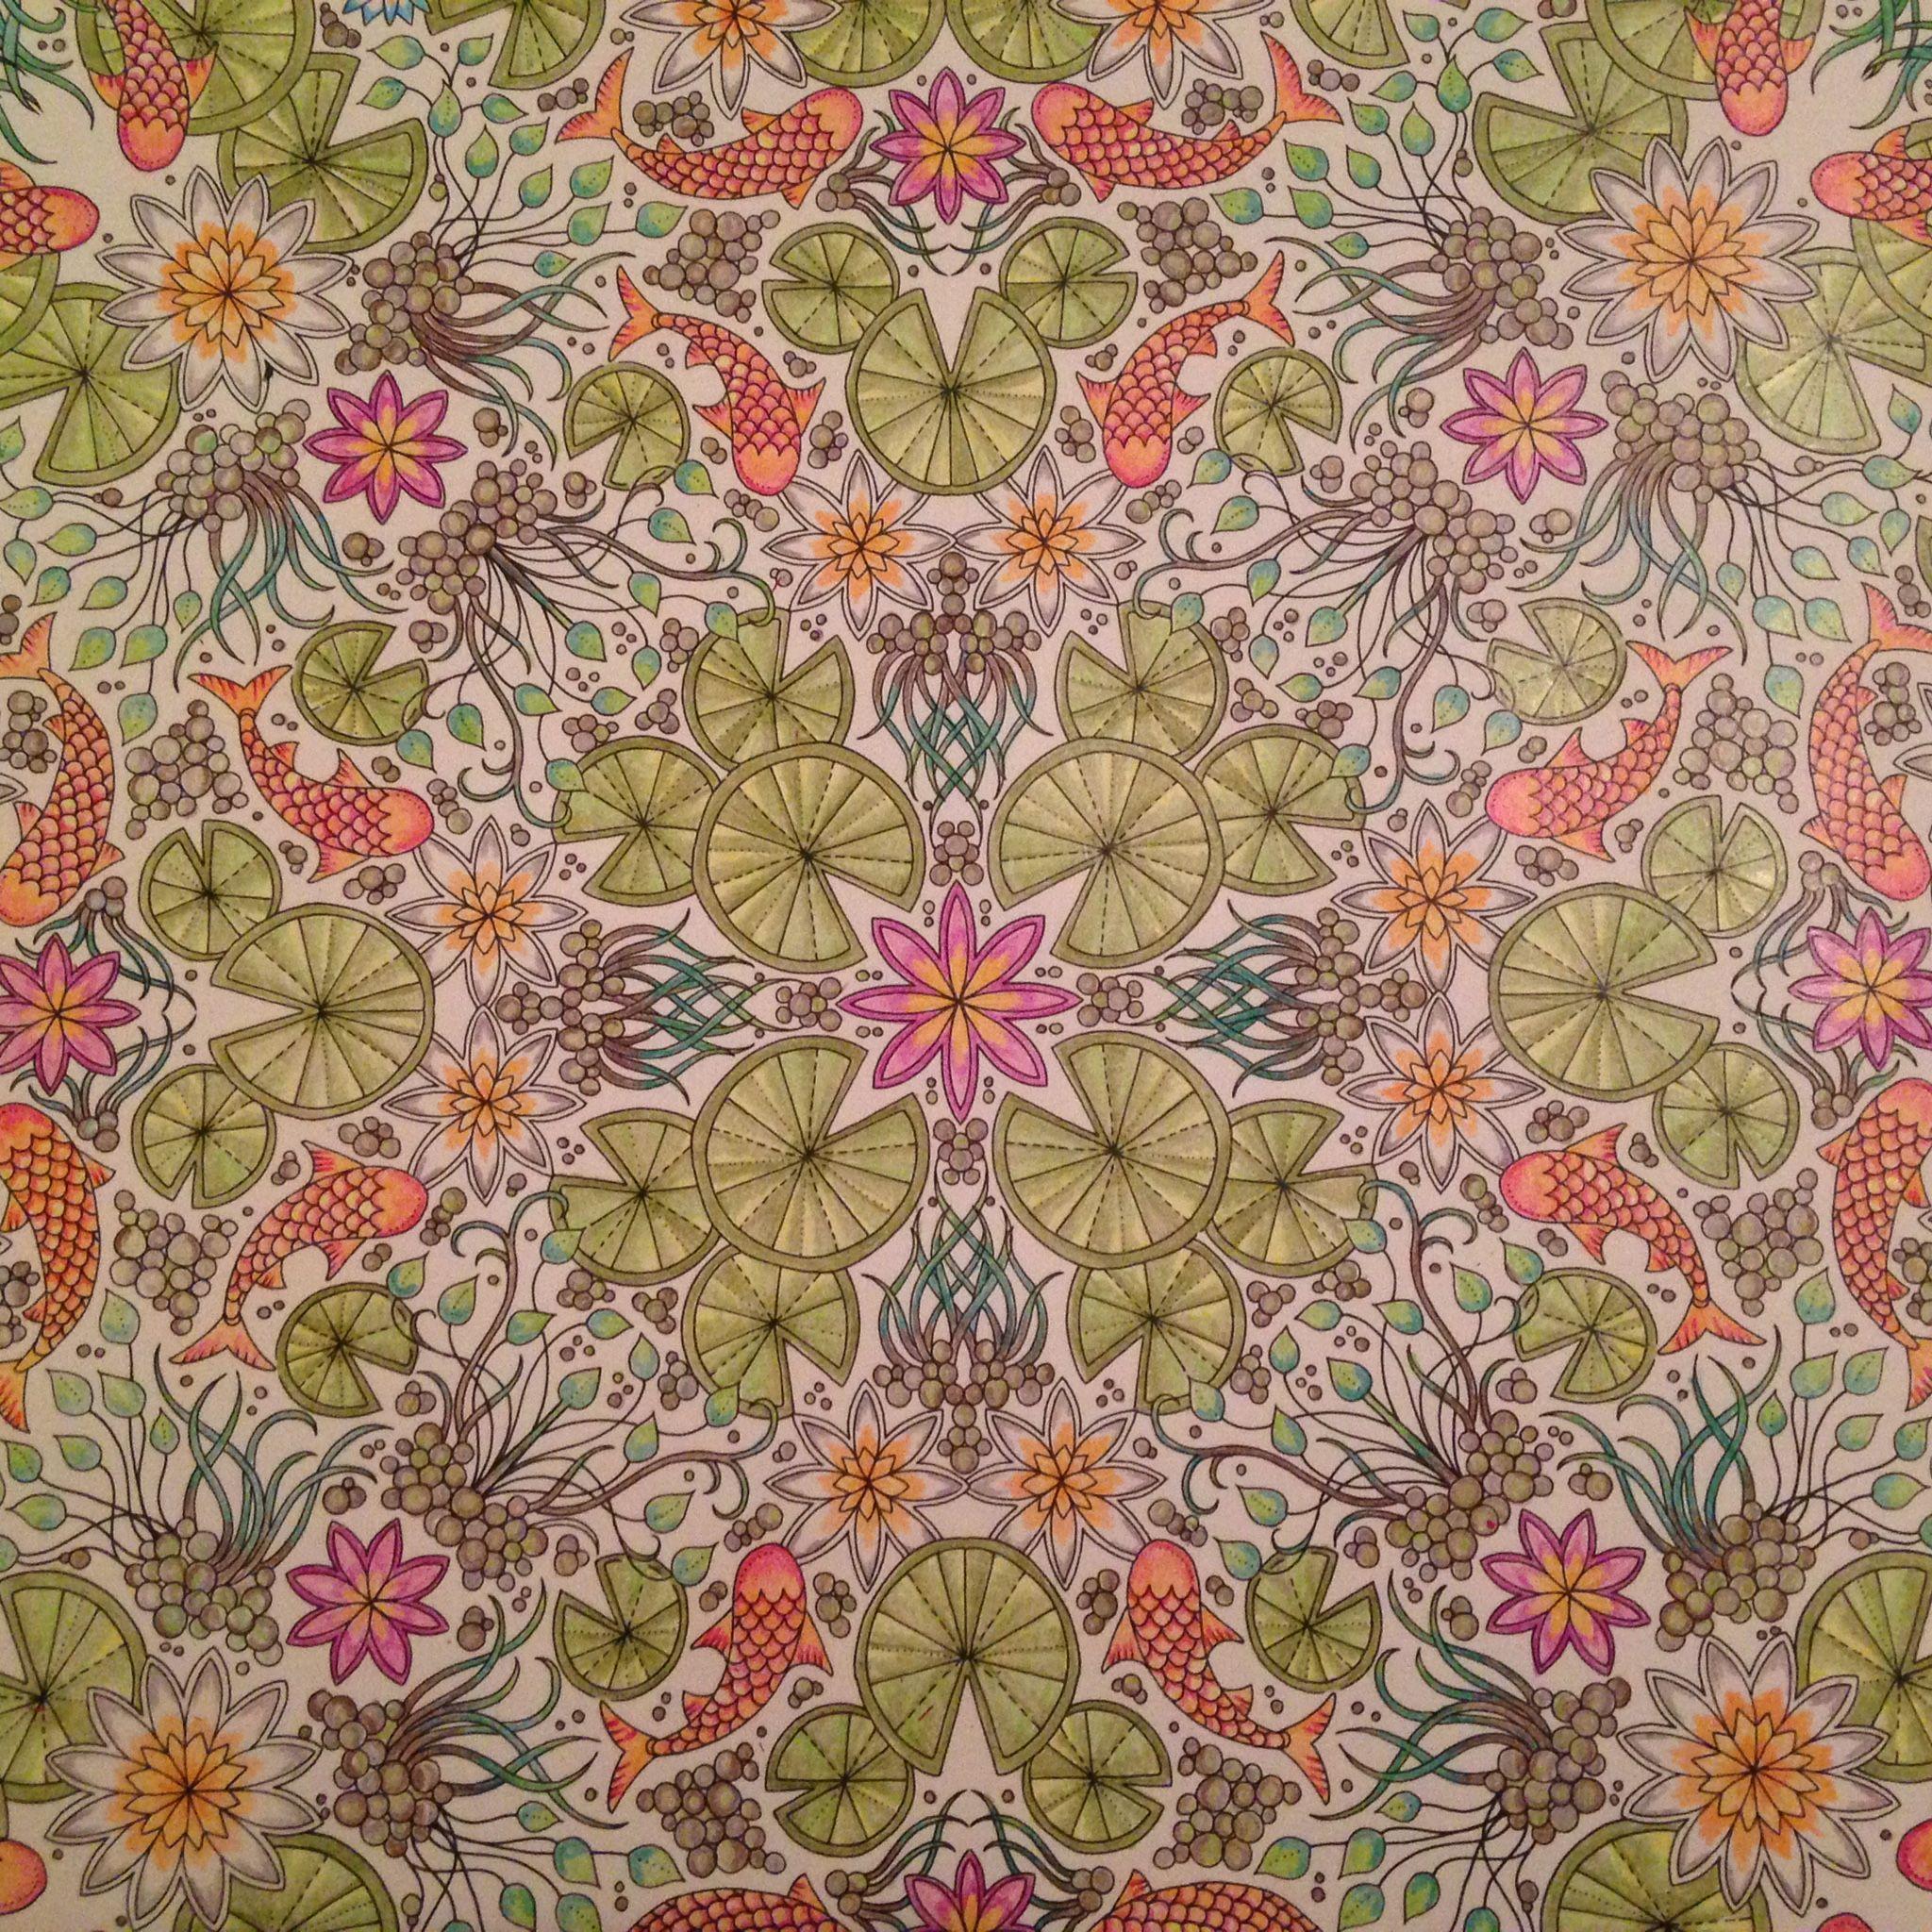 From Secret Garden colouring book | Secret Garden | Pinterest ...